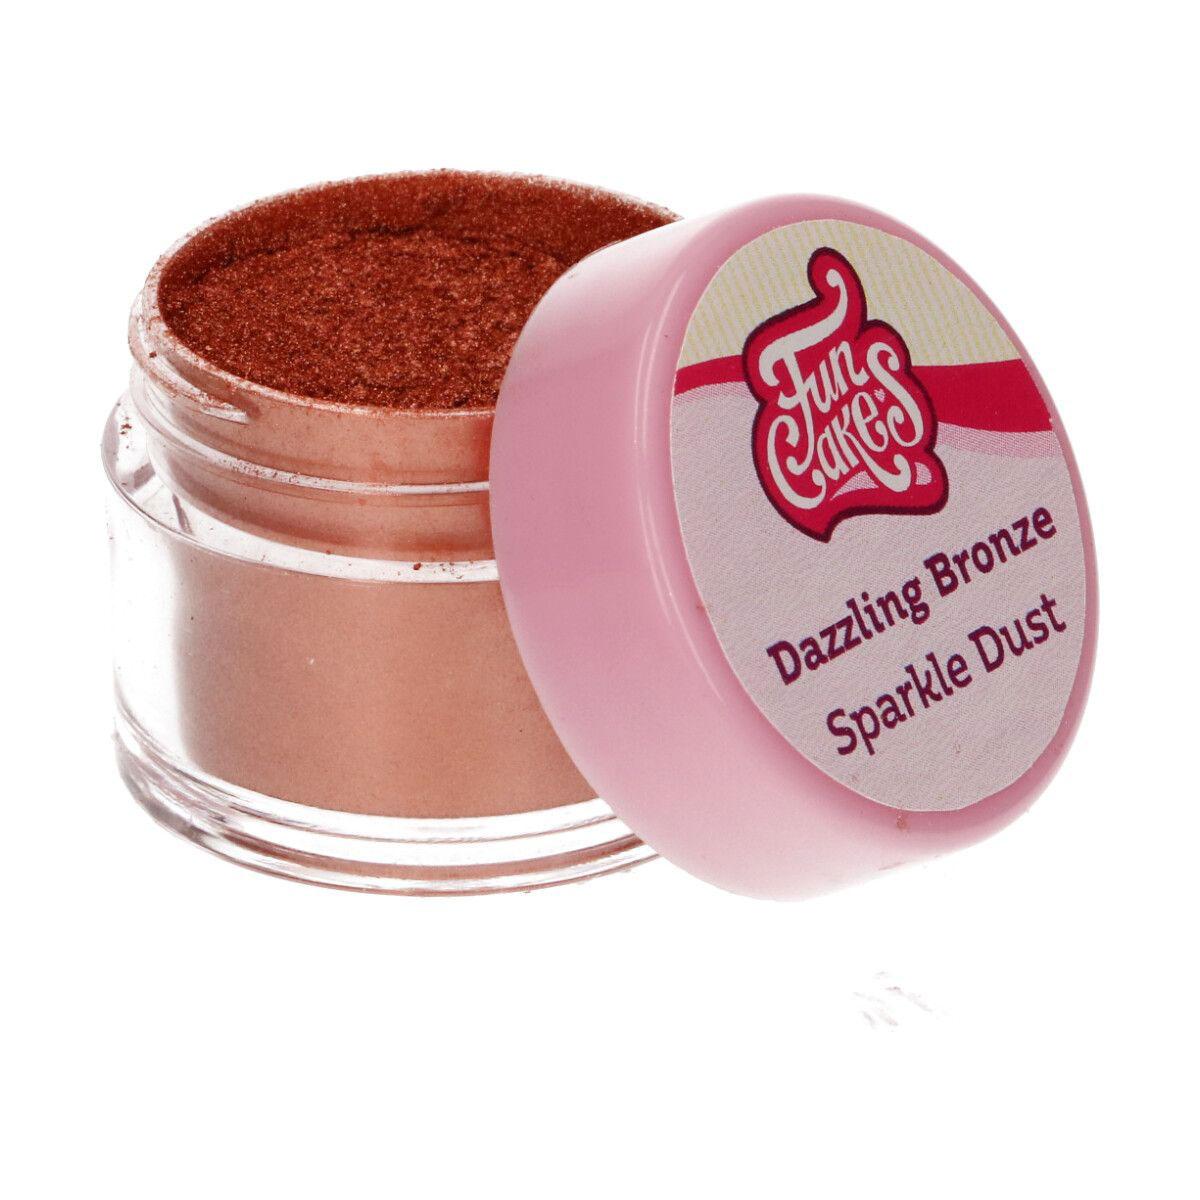 Funcakes Edible Sparkle Dust - Dazzling Bronze